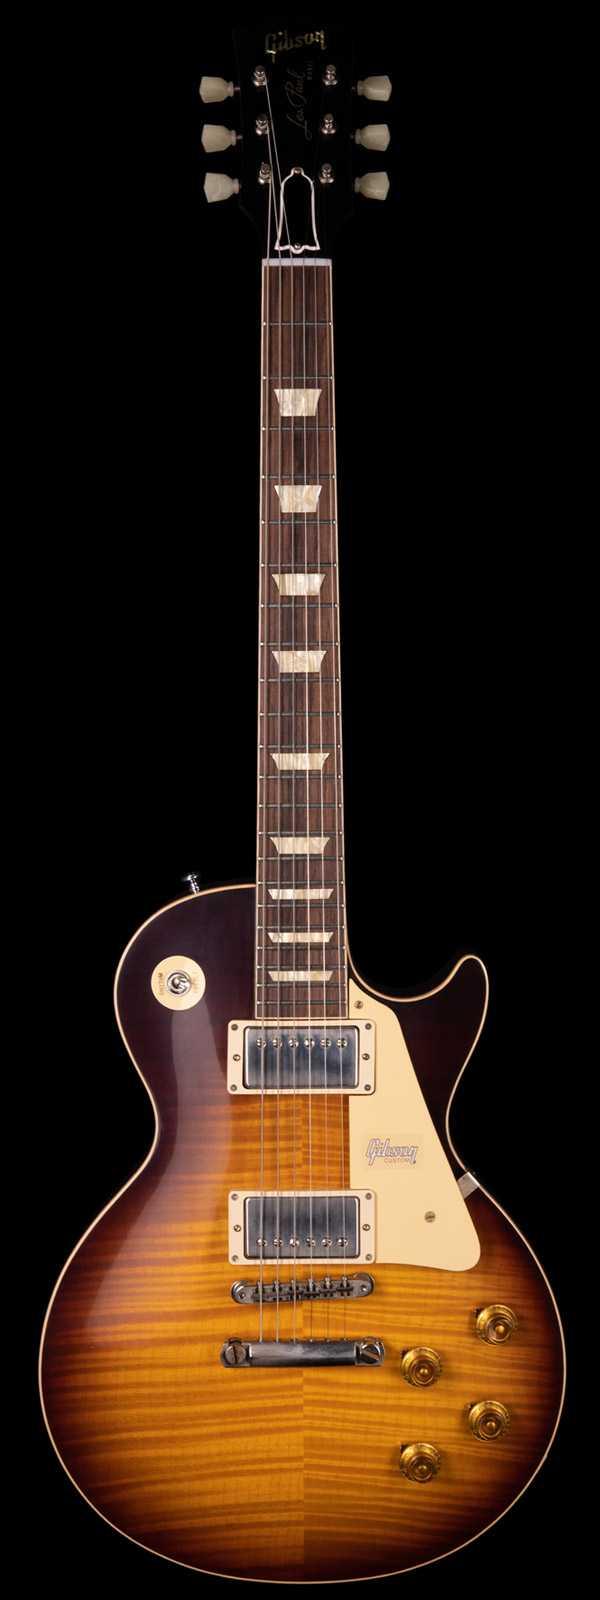 Gibson Custom Shop 60th Anniversary 1959 Les Paul Standard VOS Kindred Burst